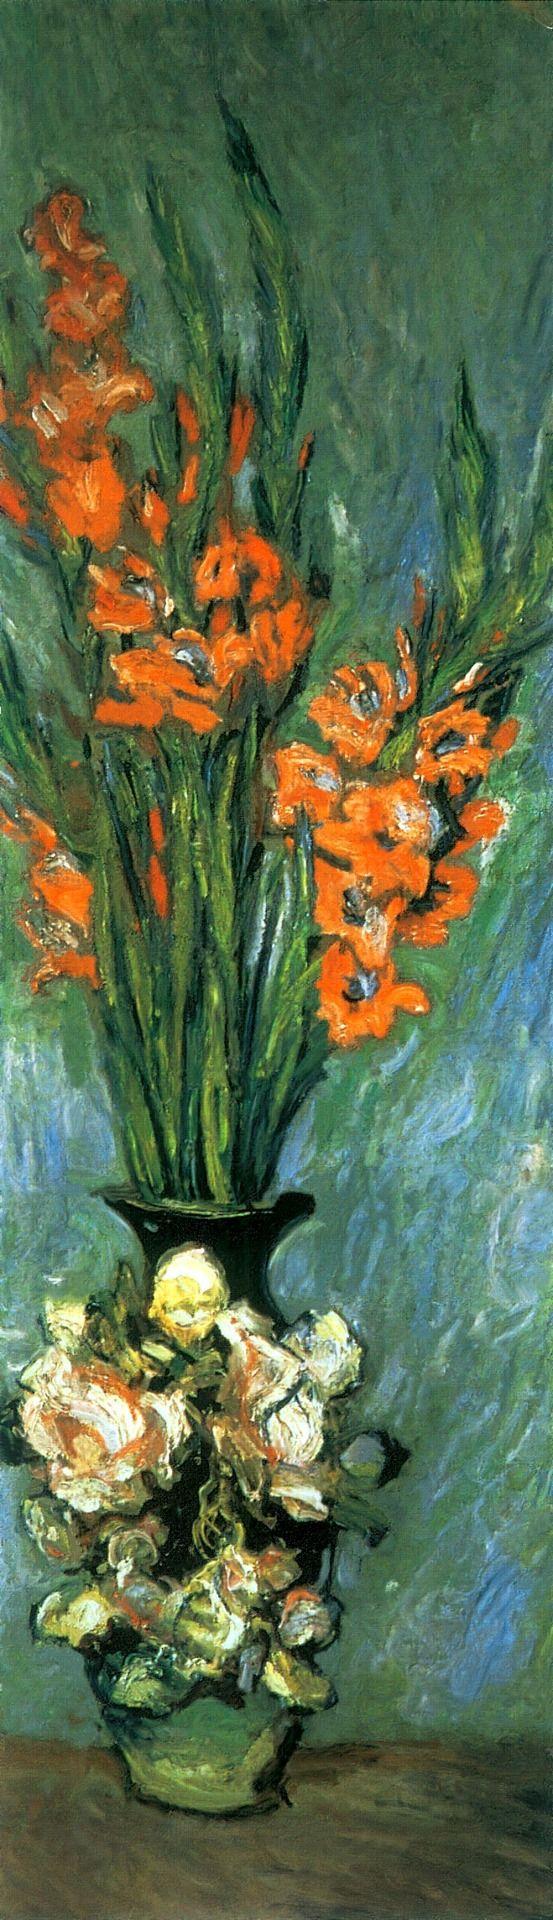 Claude Monet Style